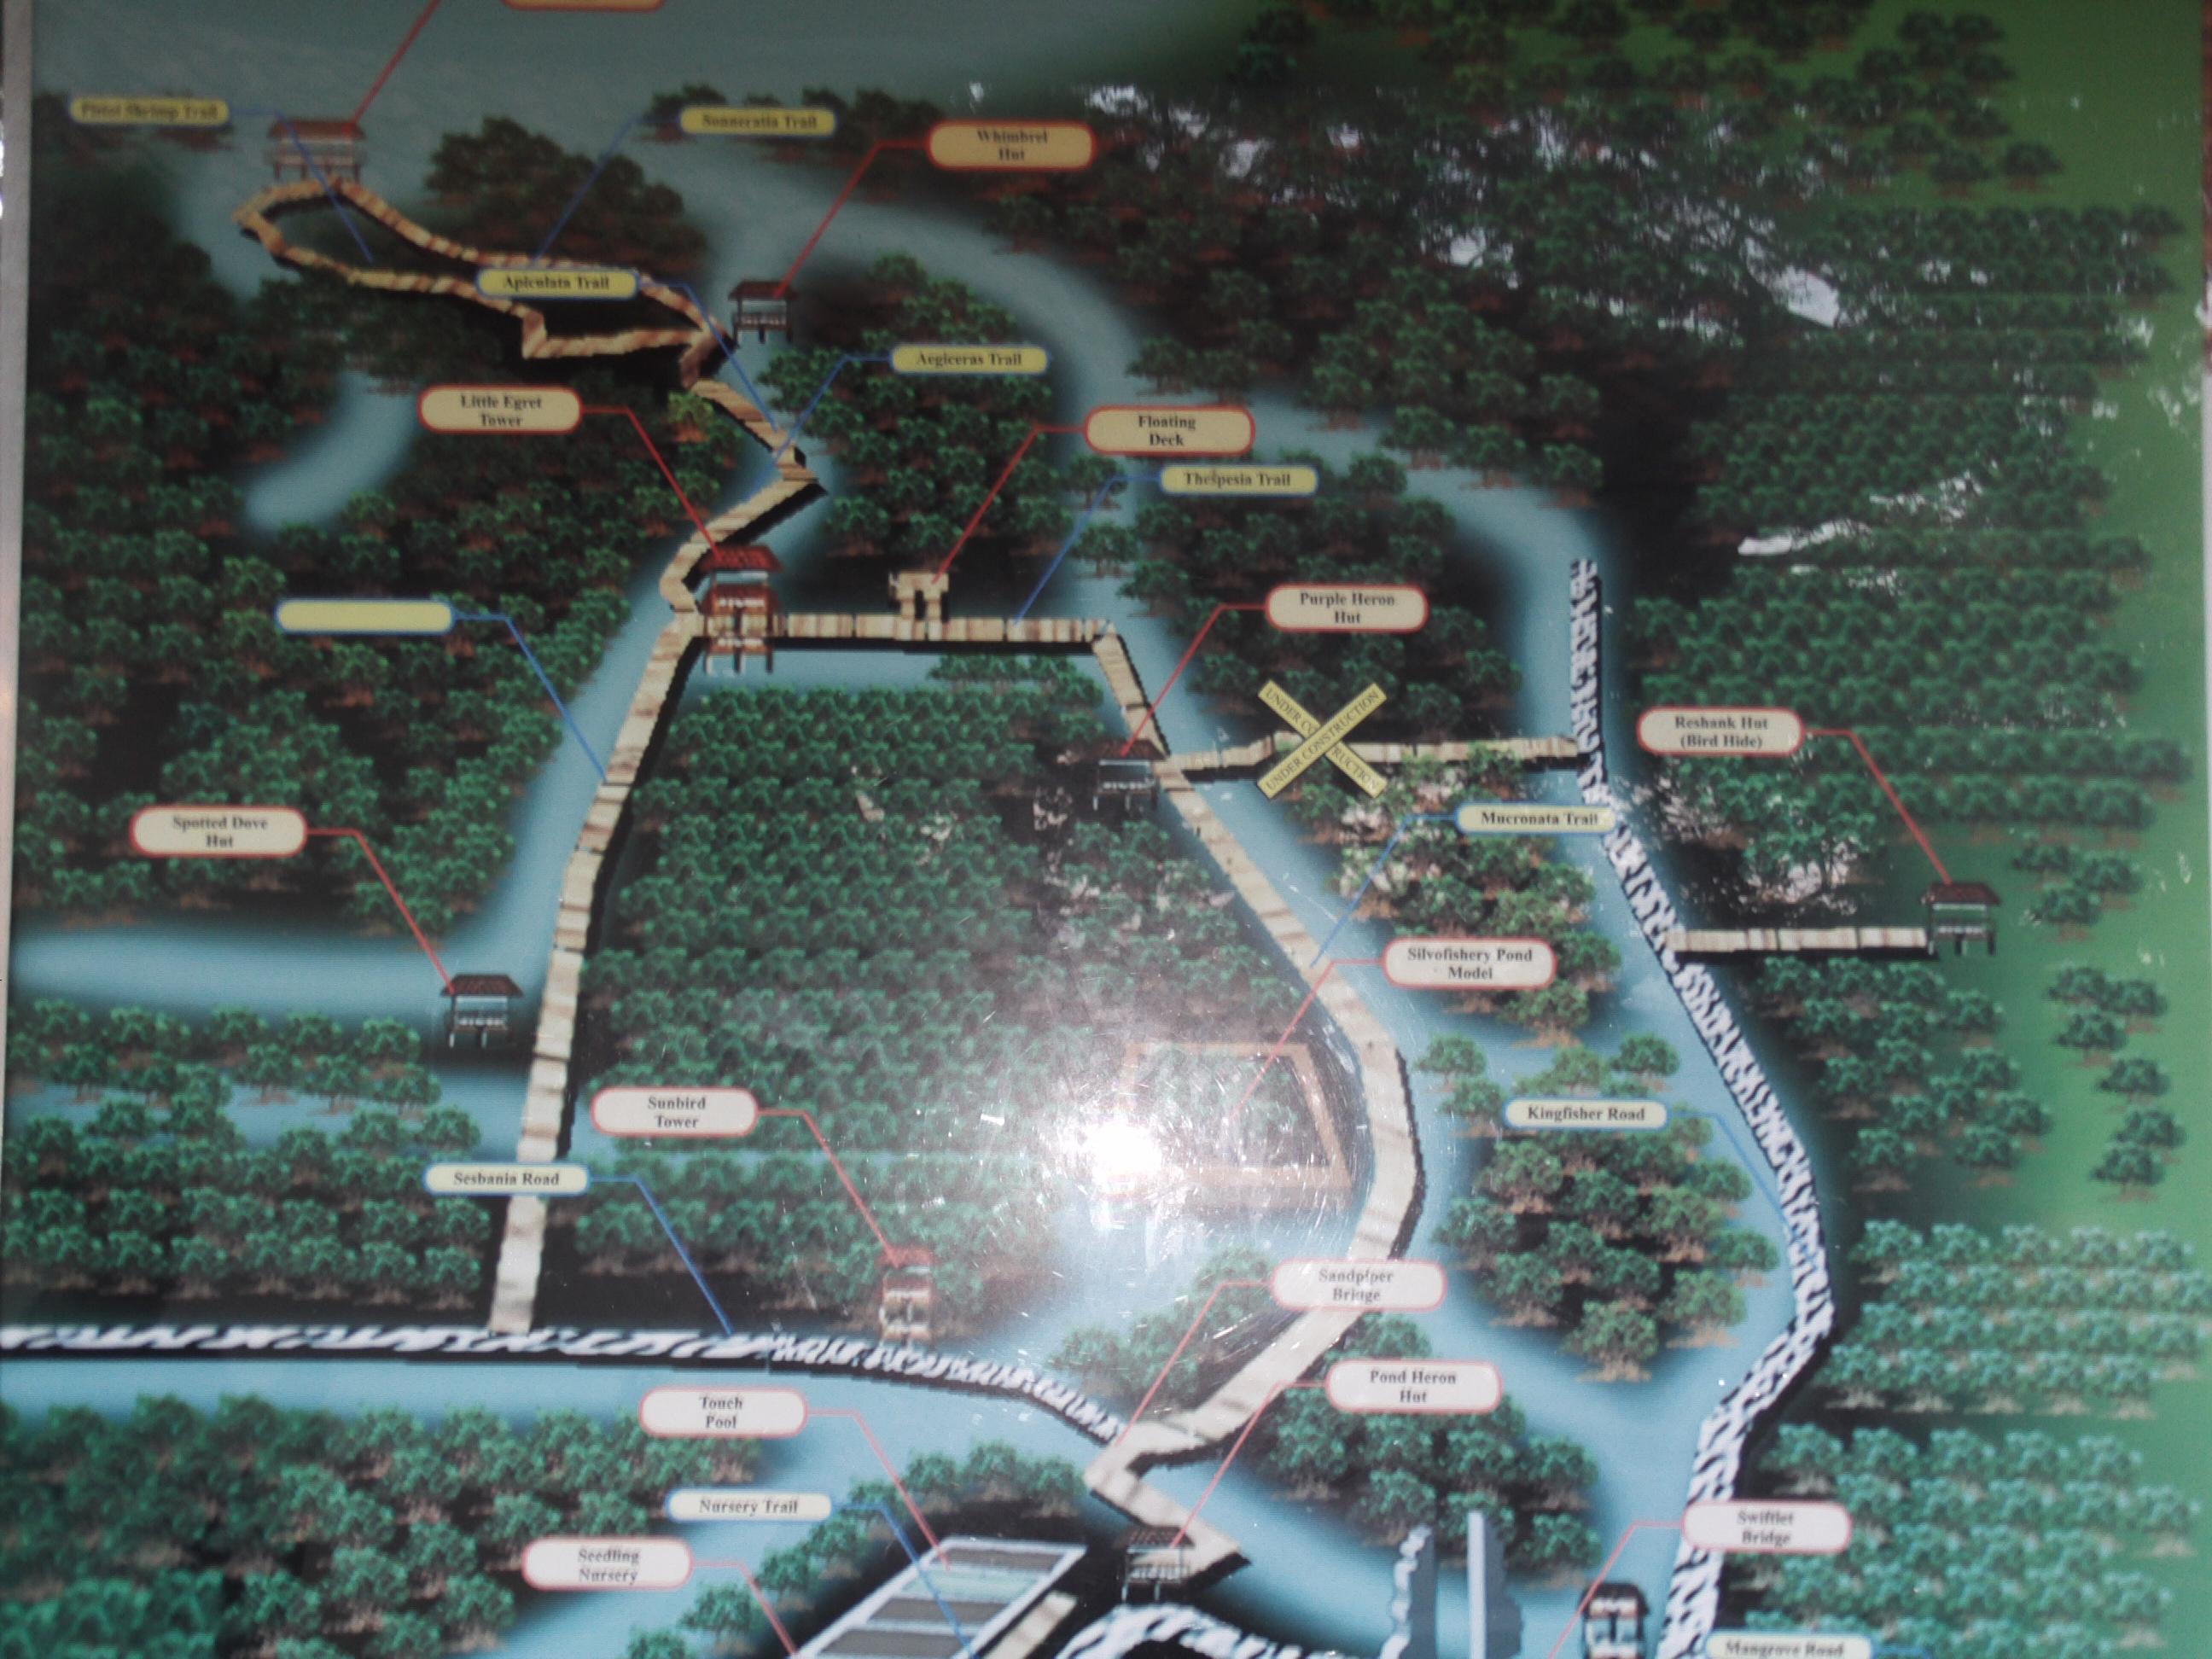 Mangrove Wisata Edukasi Tunsa Peta Rute Jalan Hutang Lumayan Panjang